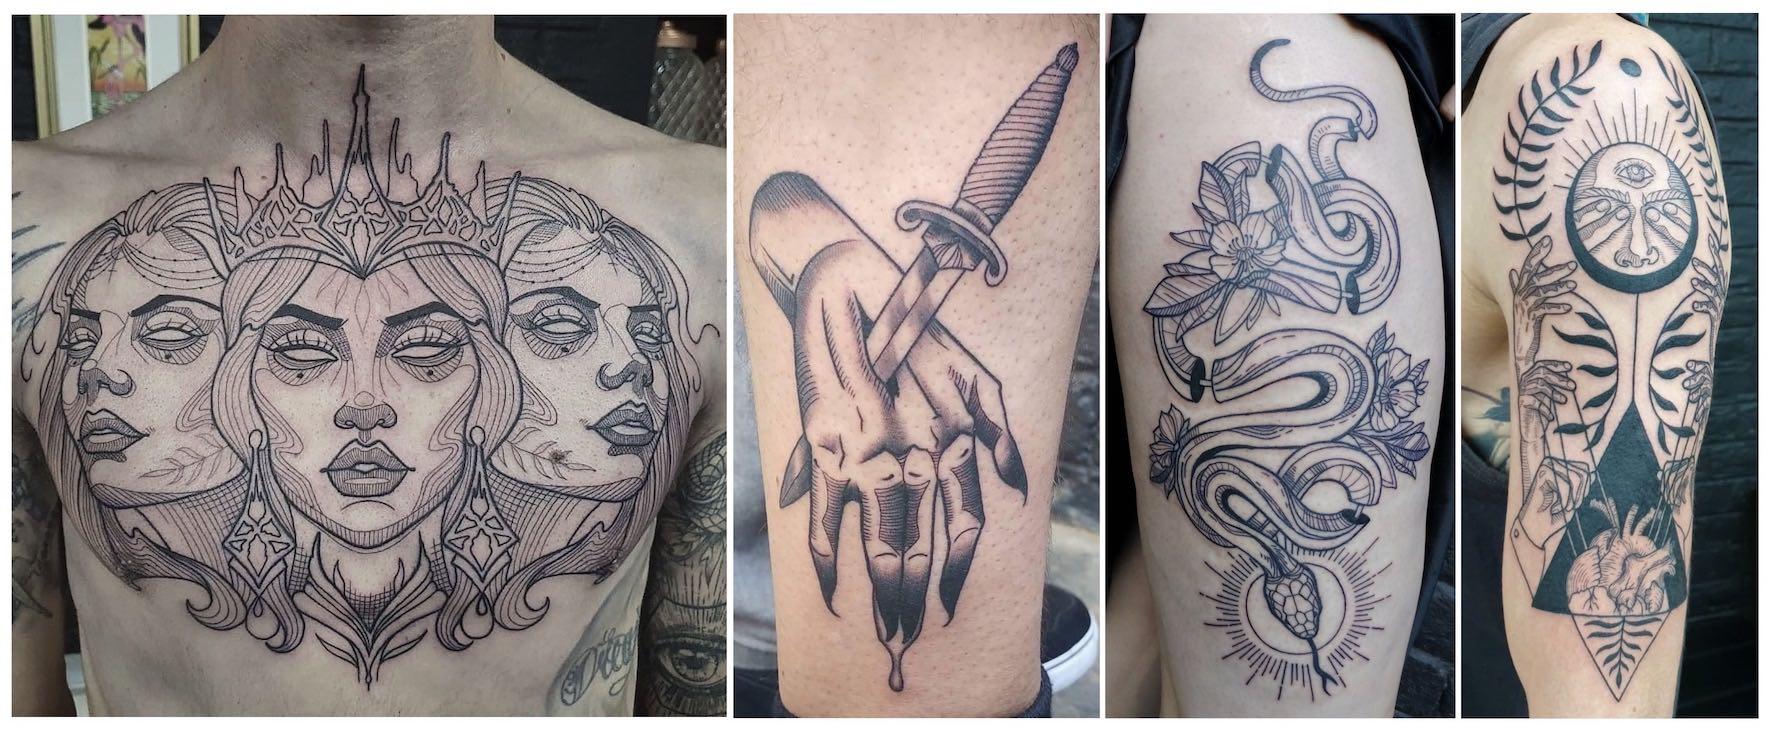 Blackwork tattoos done by Jade Alexandra